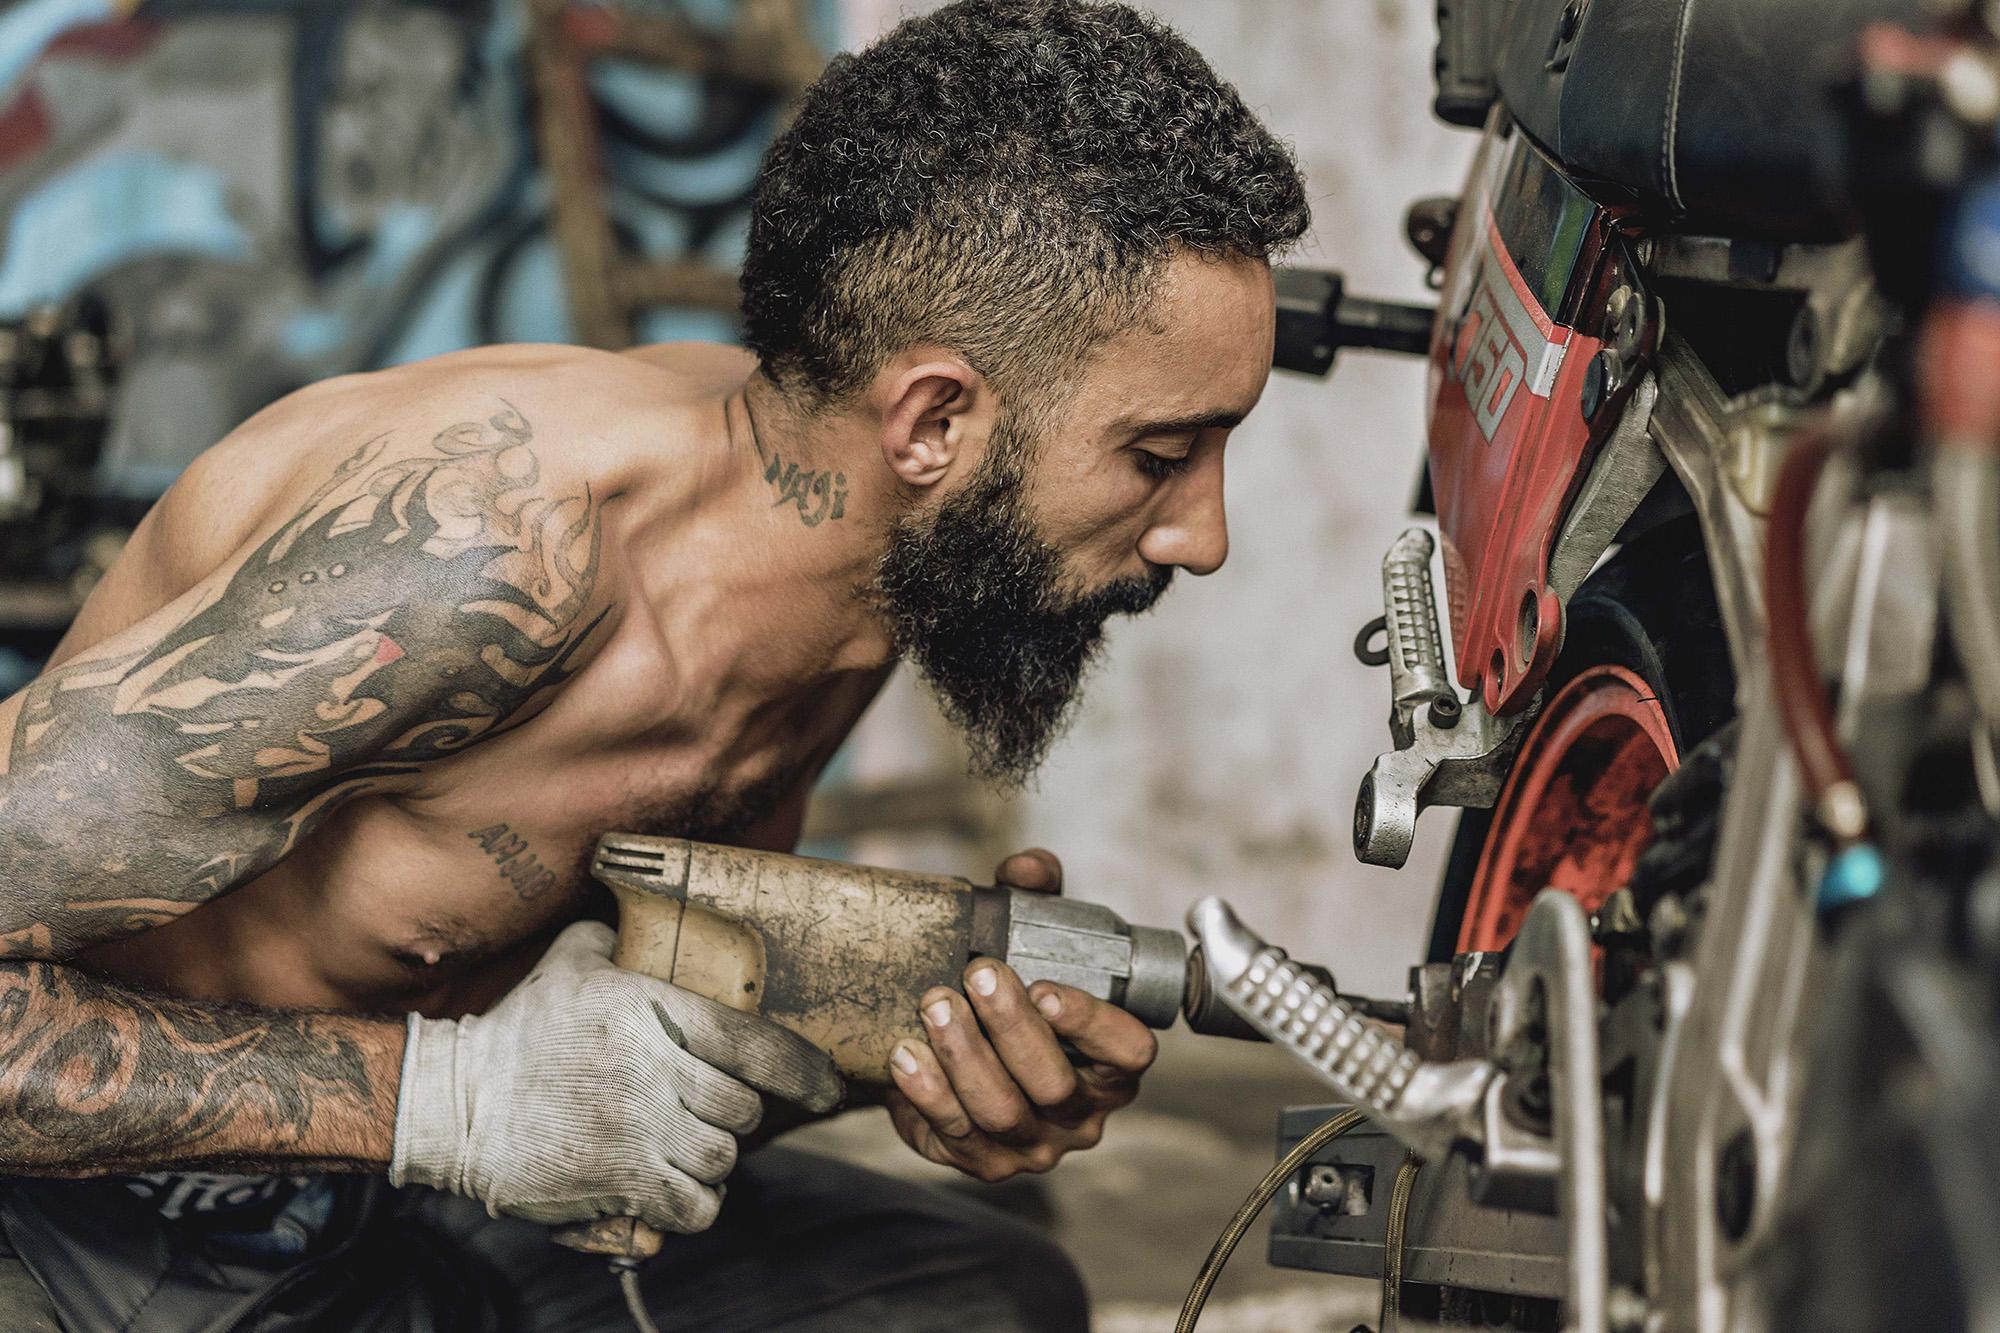 Where ART you from | Ali Kanaan | Mechanic